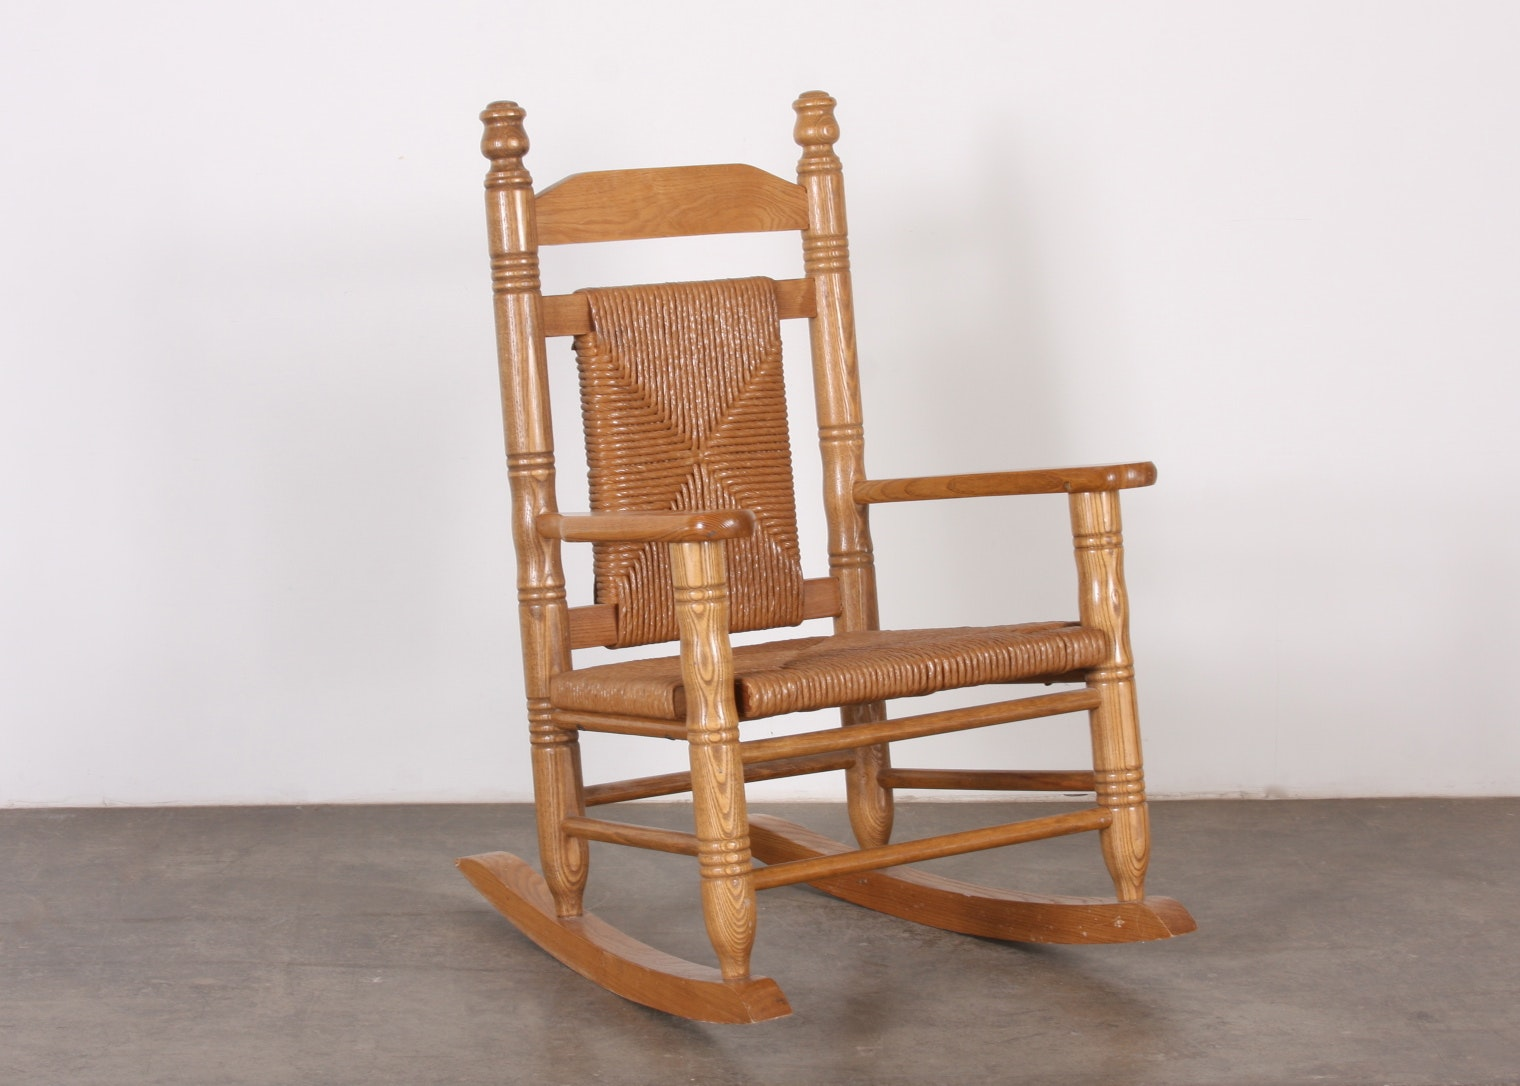 Childu0027s Wood Rocking Chair From Cracker Barrel ...